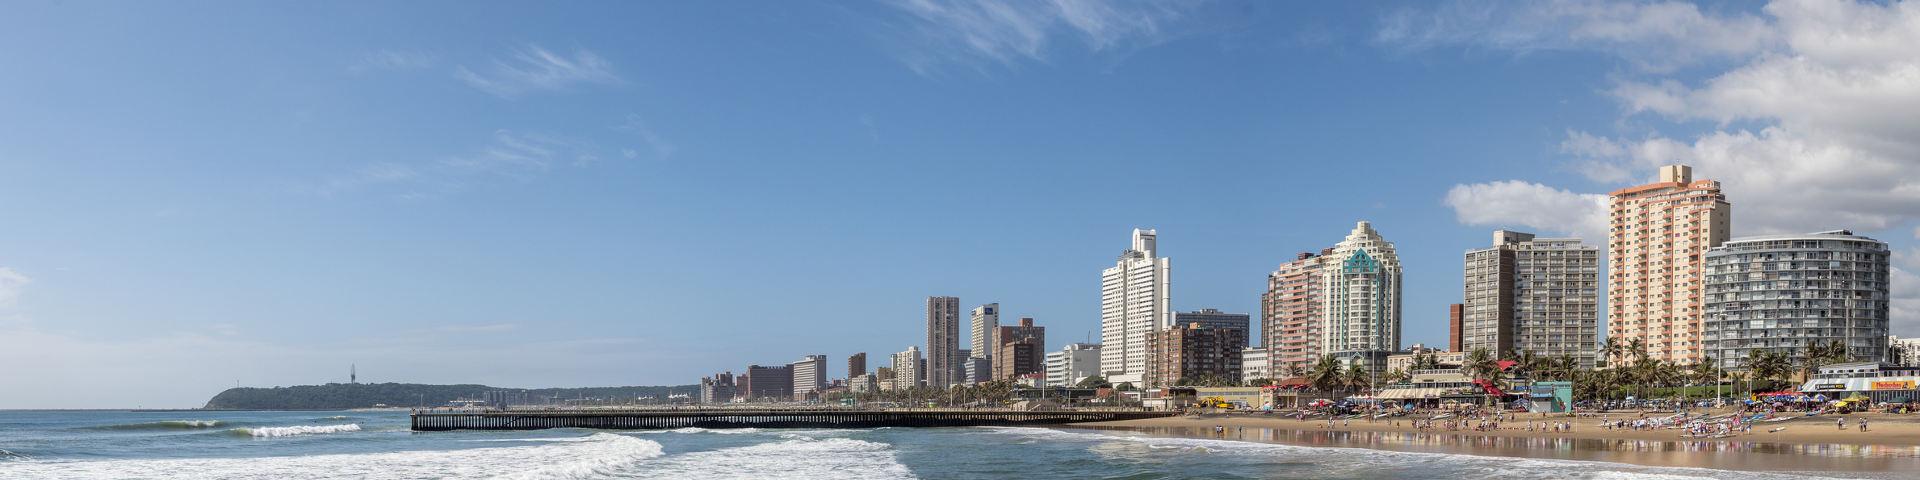 Durban hero